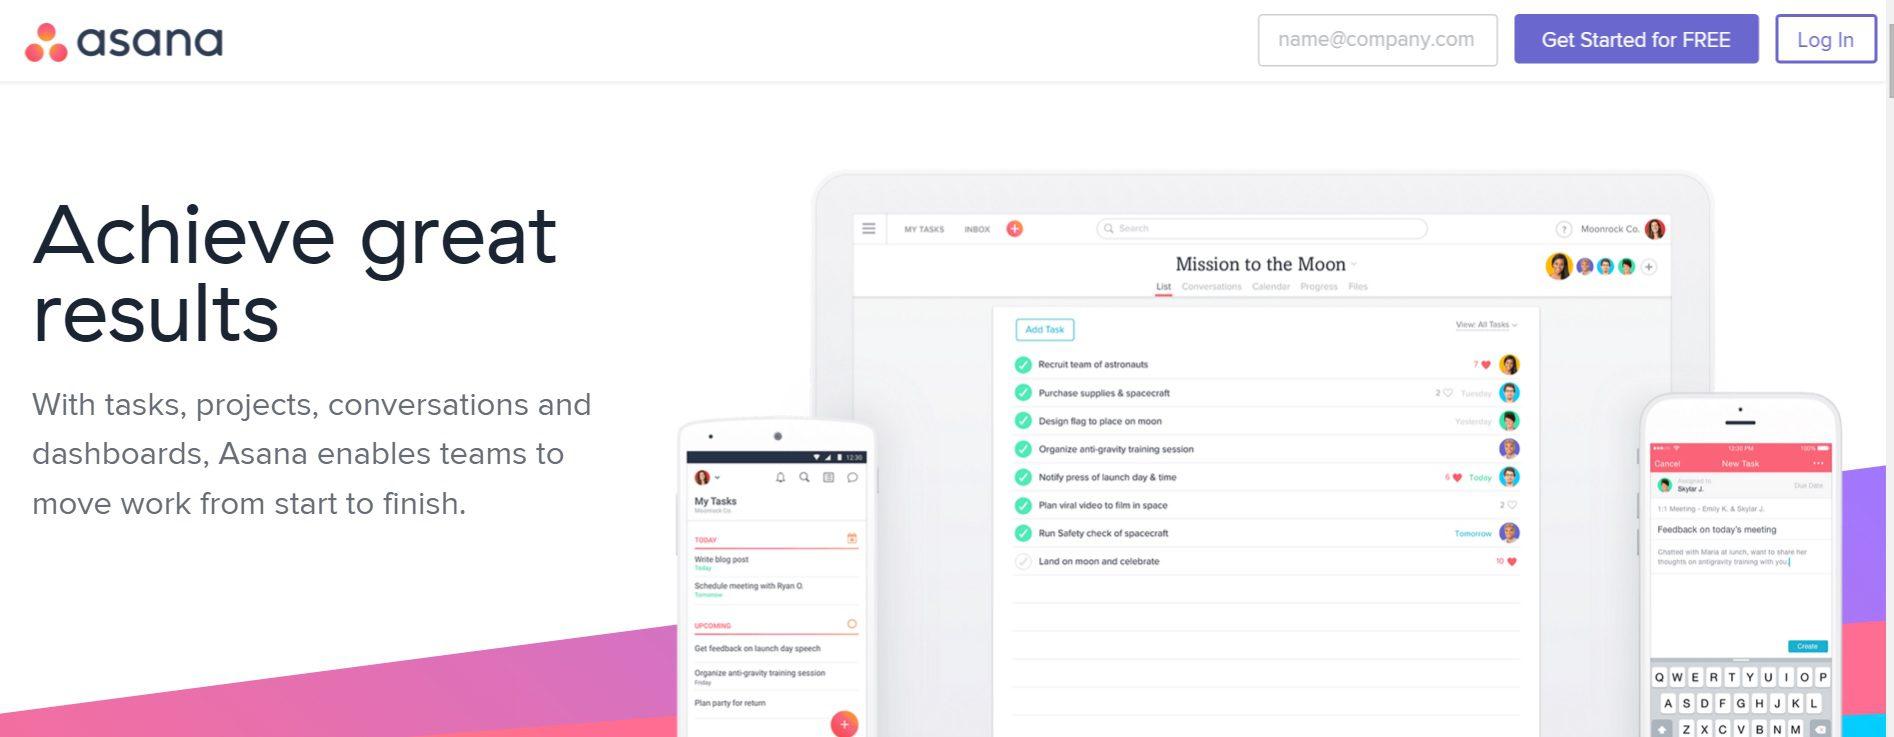 4 Project Management Tools To Kickstart Your Team's Productivity - Asana